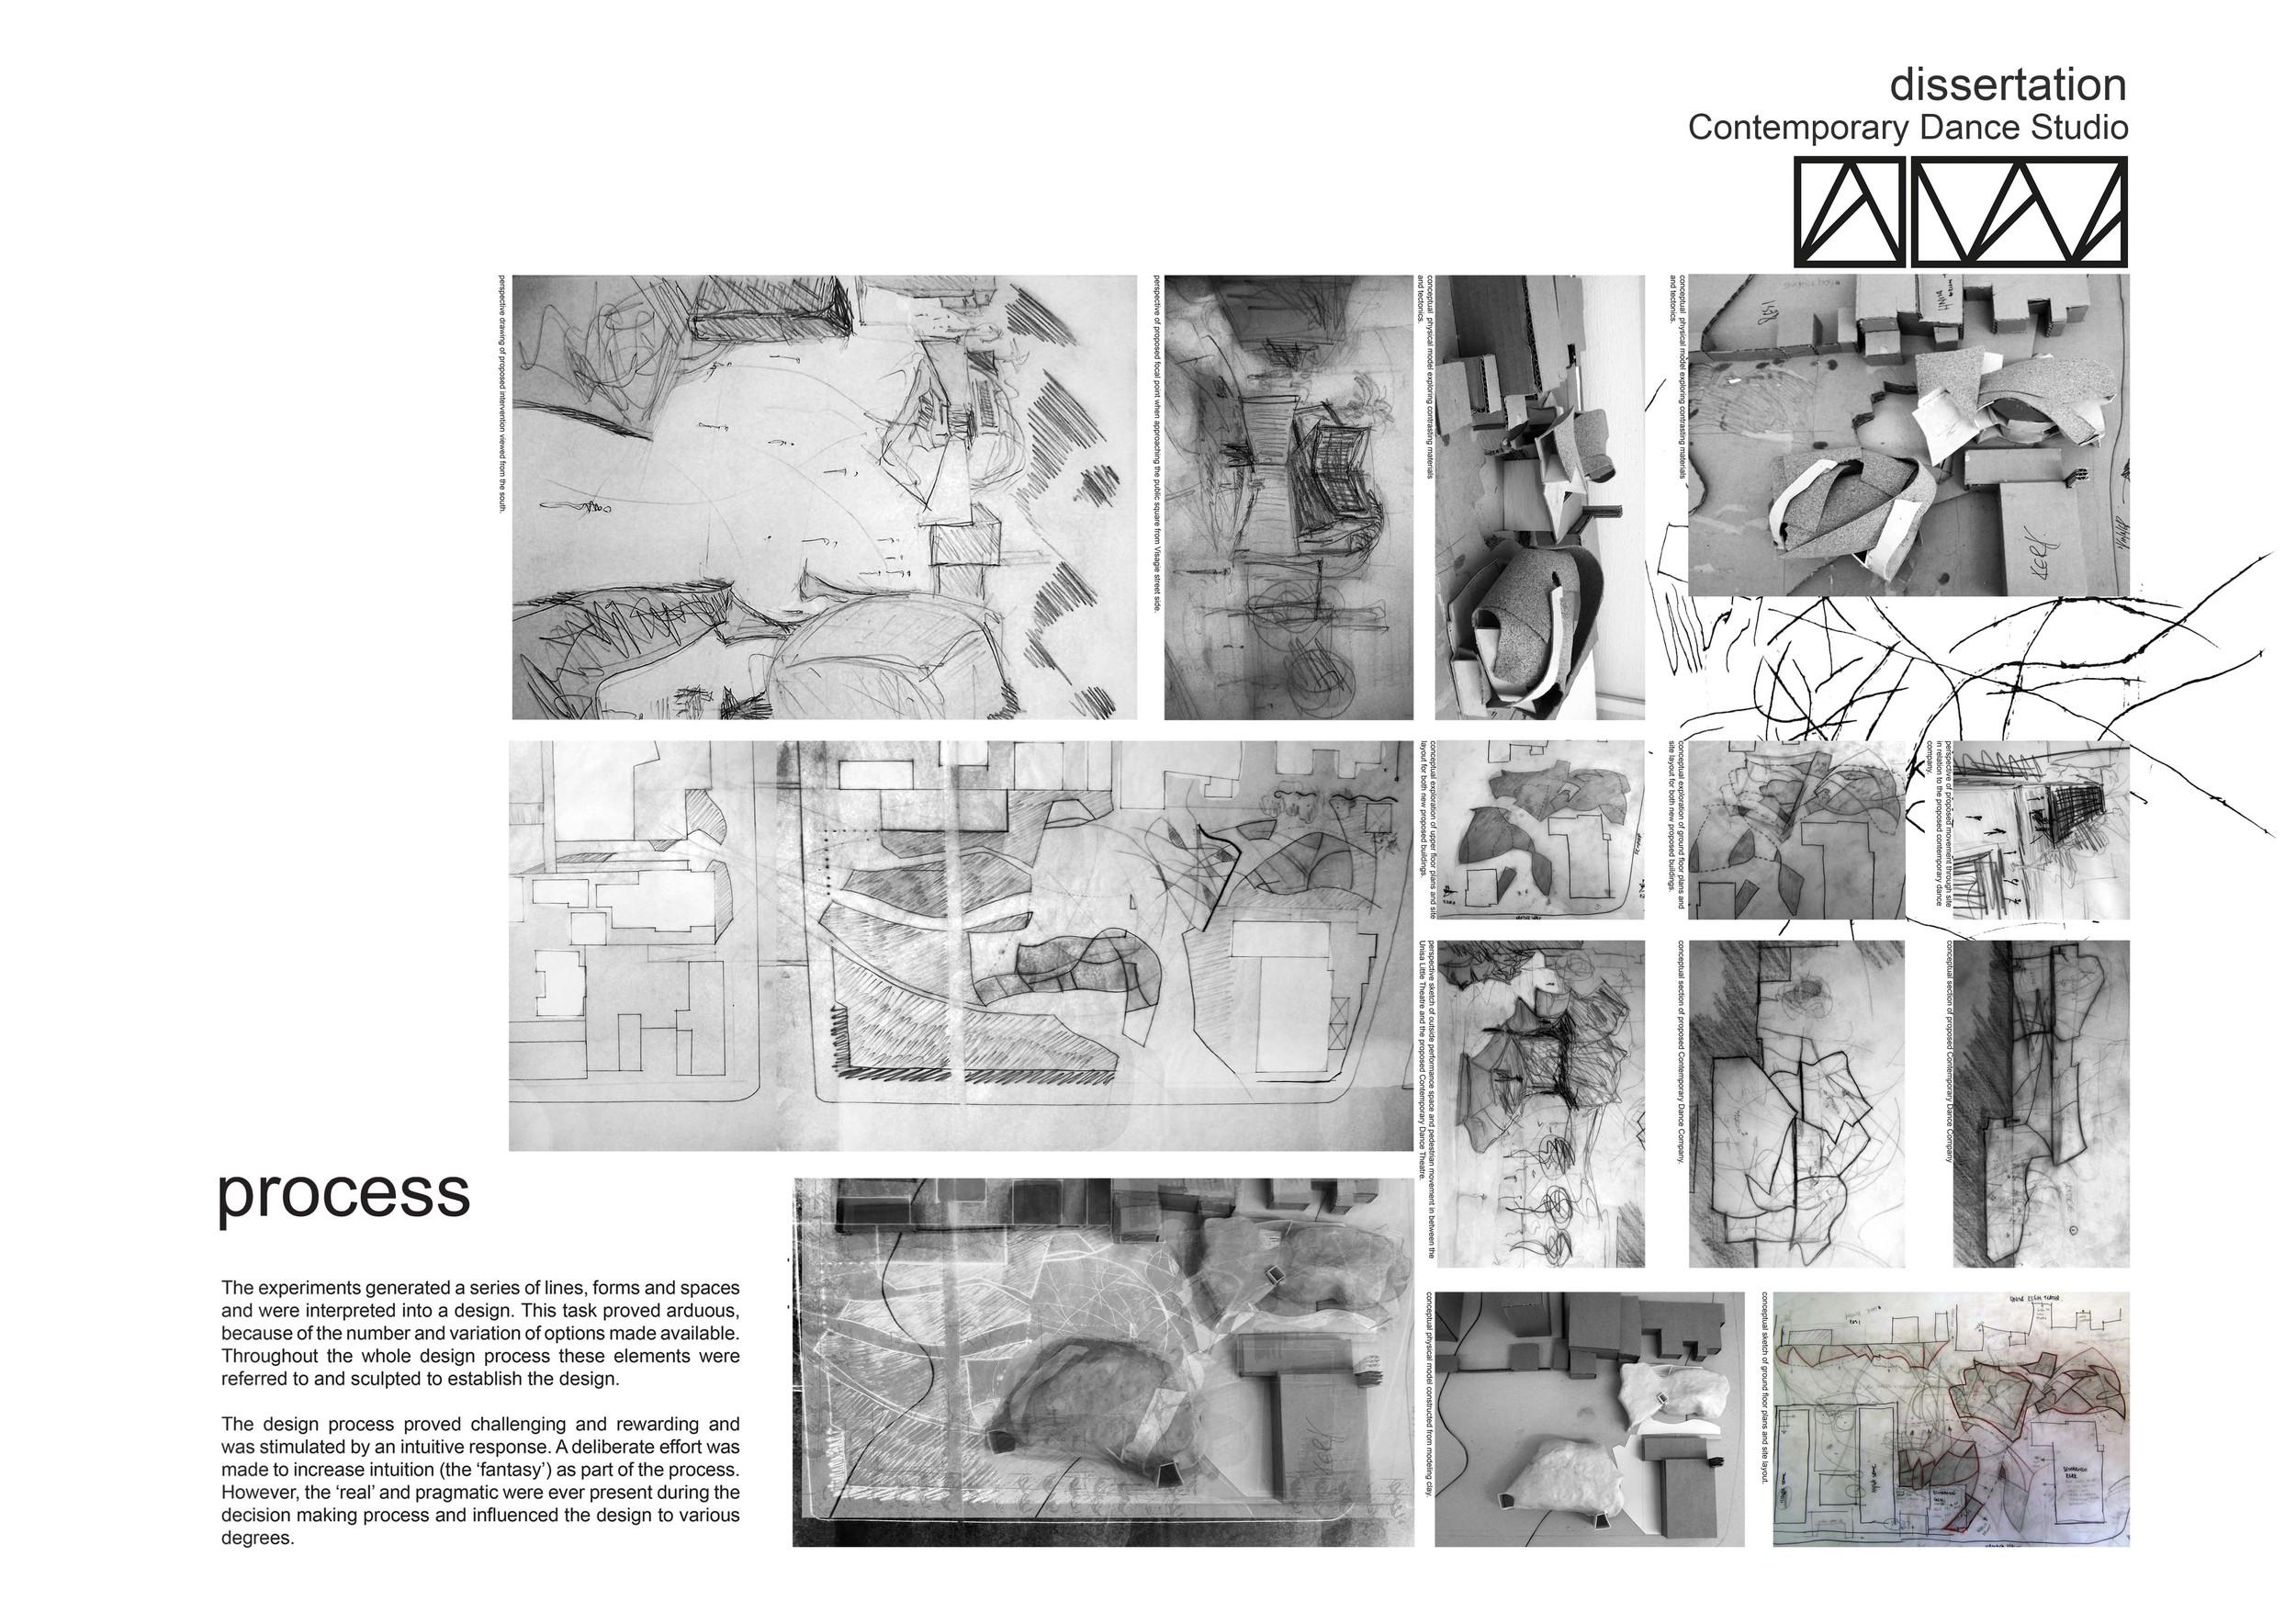 5.0 - Projects Dissertation 02.jpg